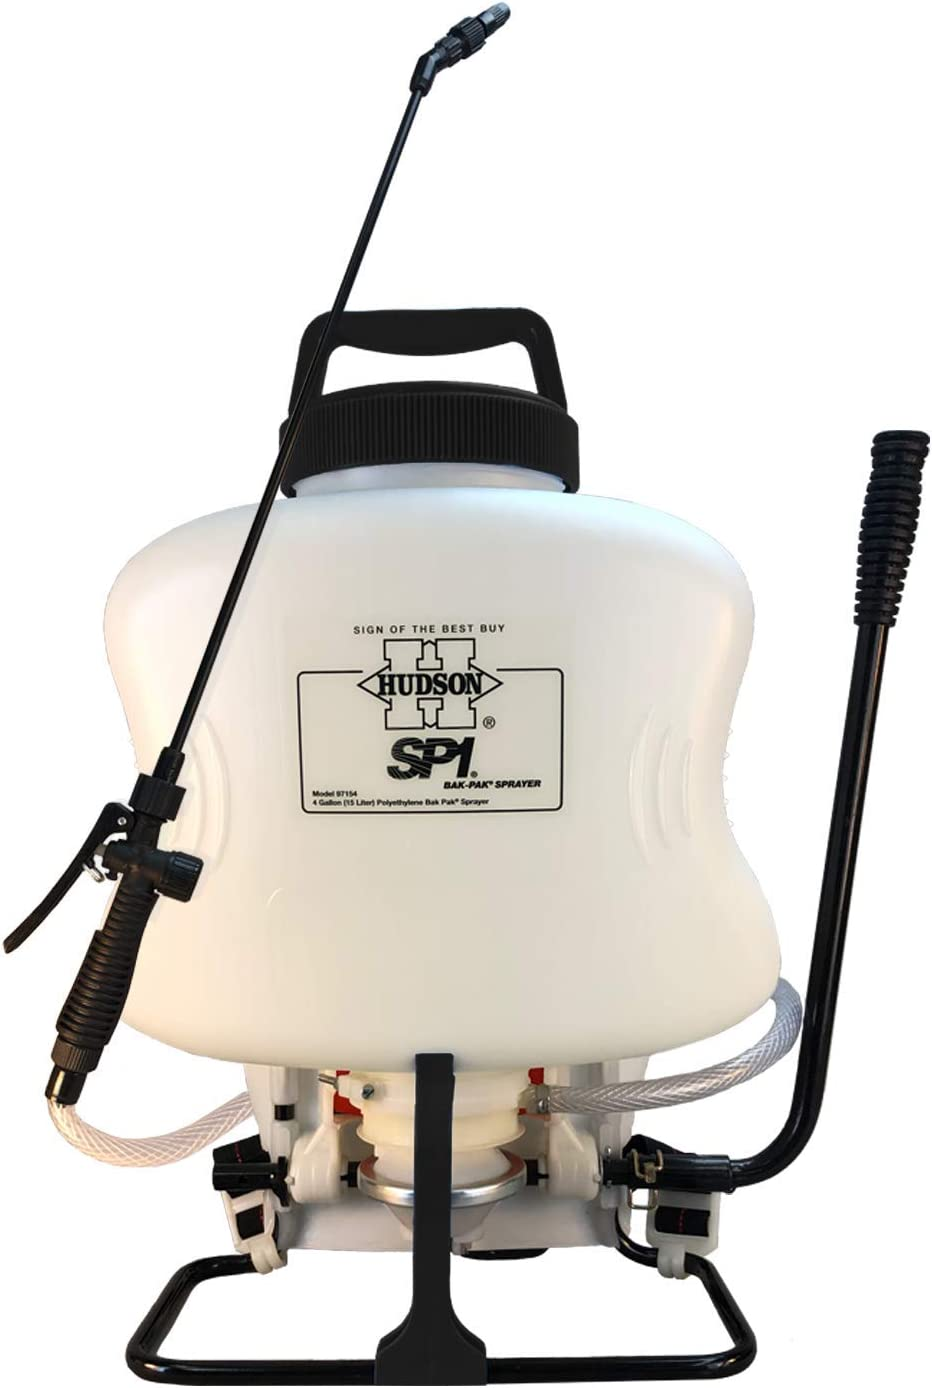 Hudson SP1 Sprayer Sealed Diaphragm Pump